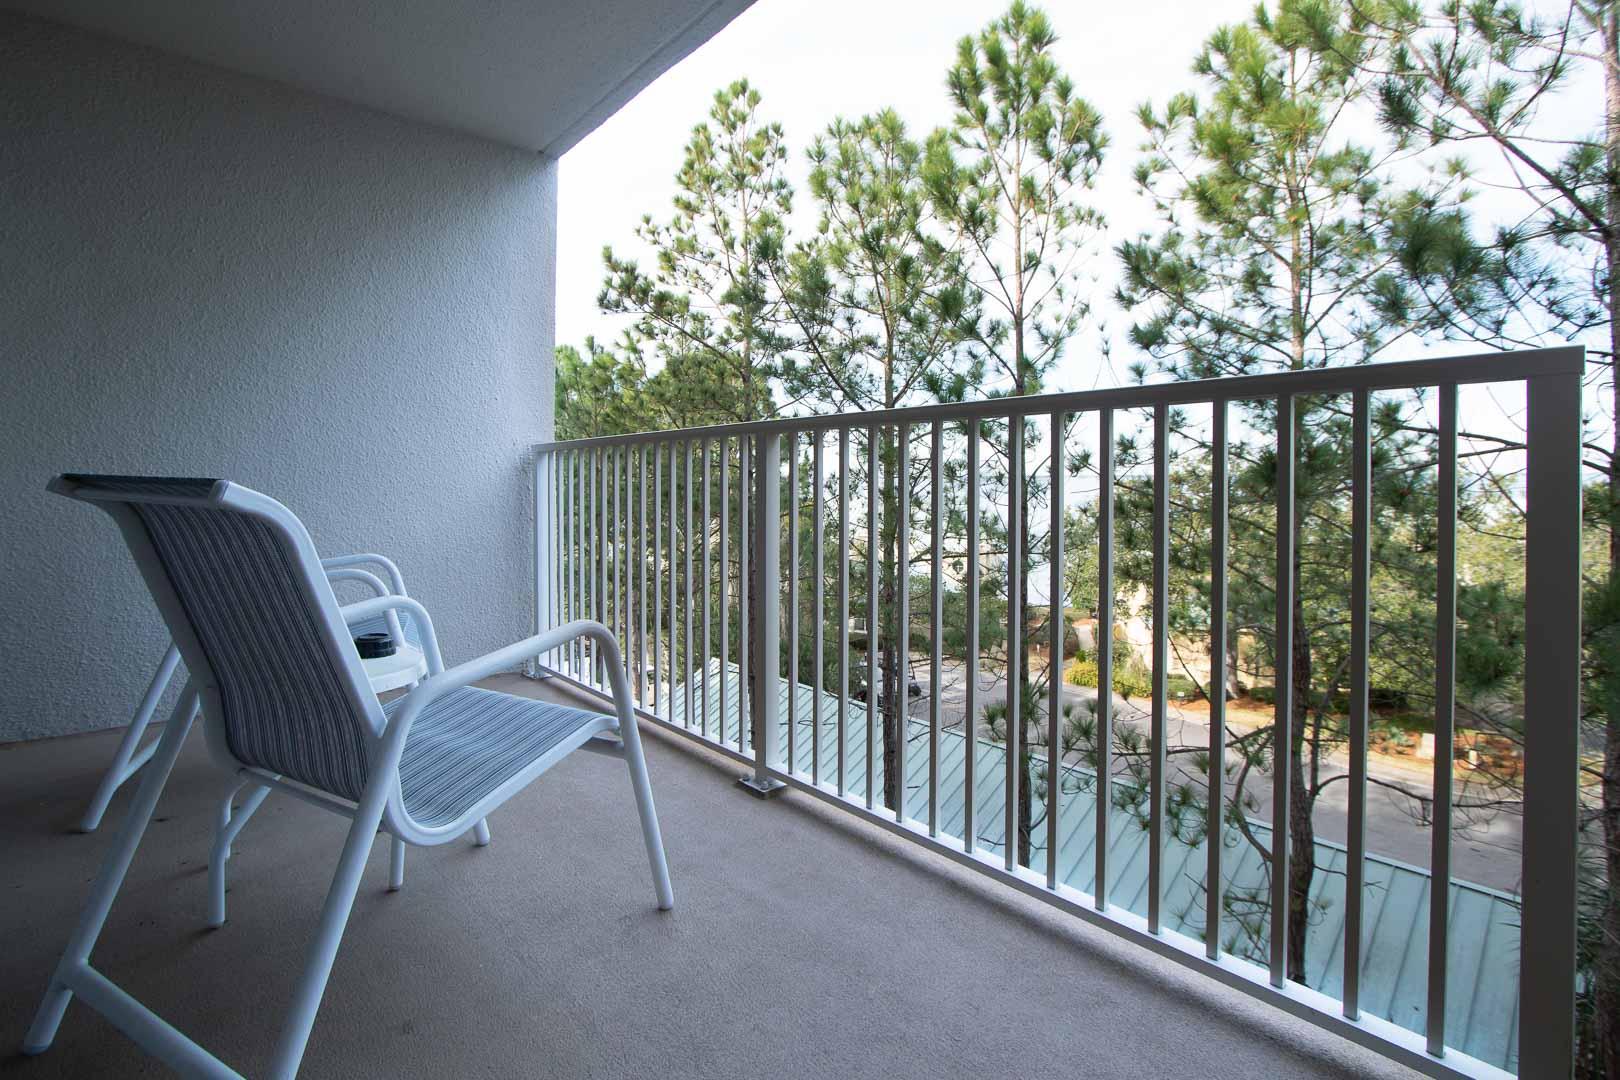 A cozy balcony view at VRI's Bay Club of Sandestin in Florida.